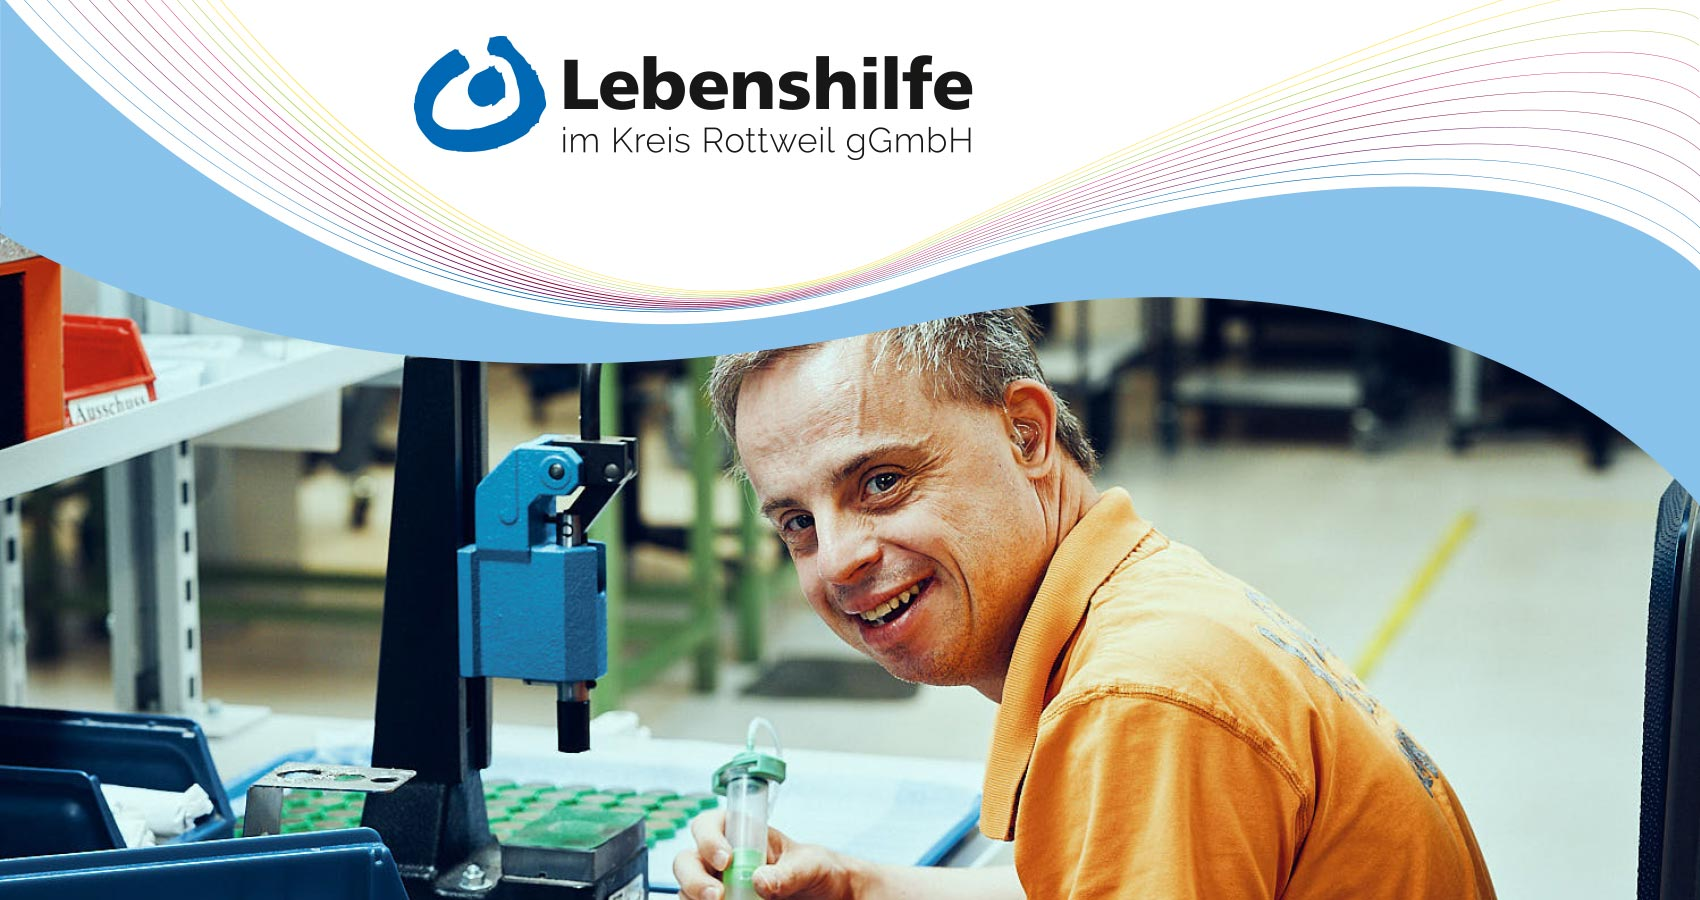 Lebenshilfe im Kreis Rottweil gGmbH - Arbeitsbereiche